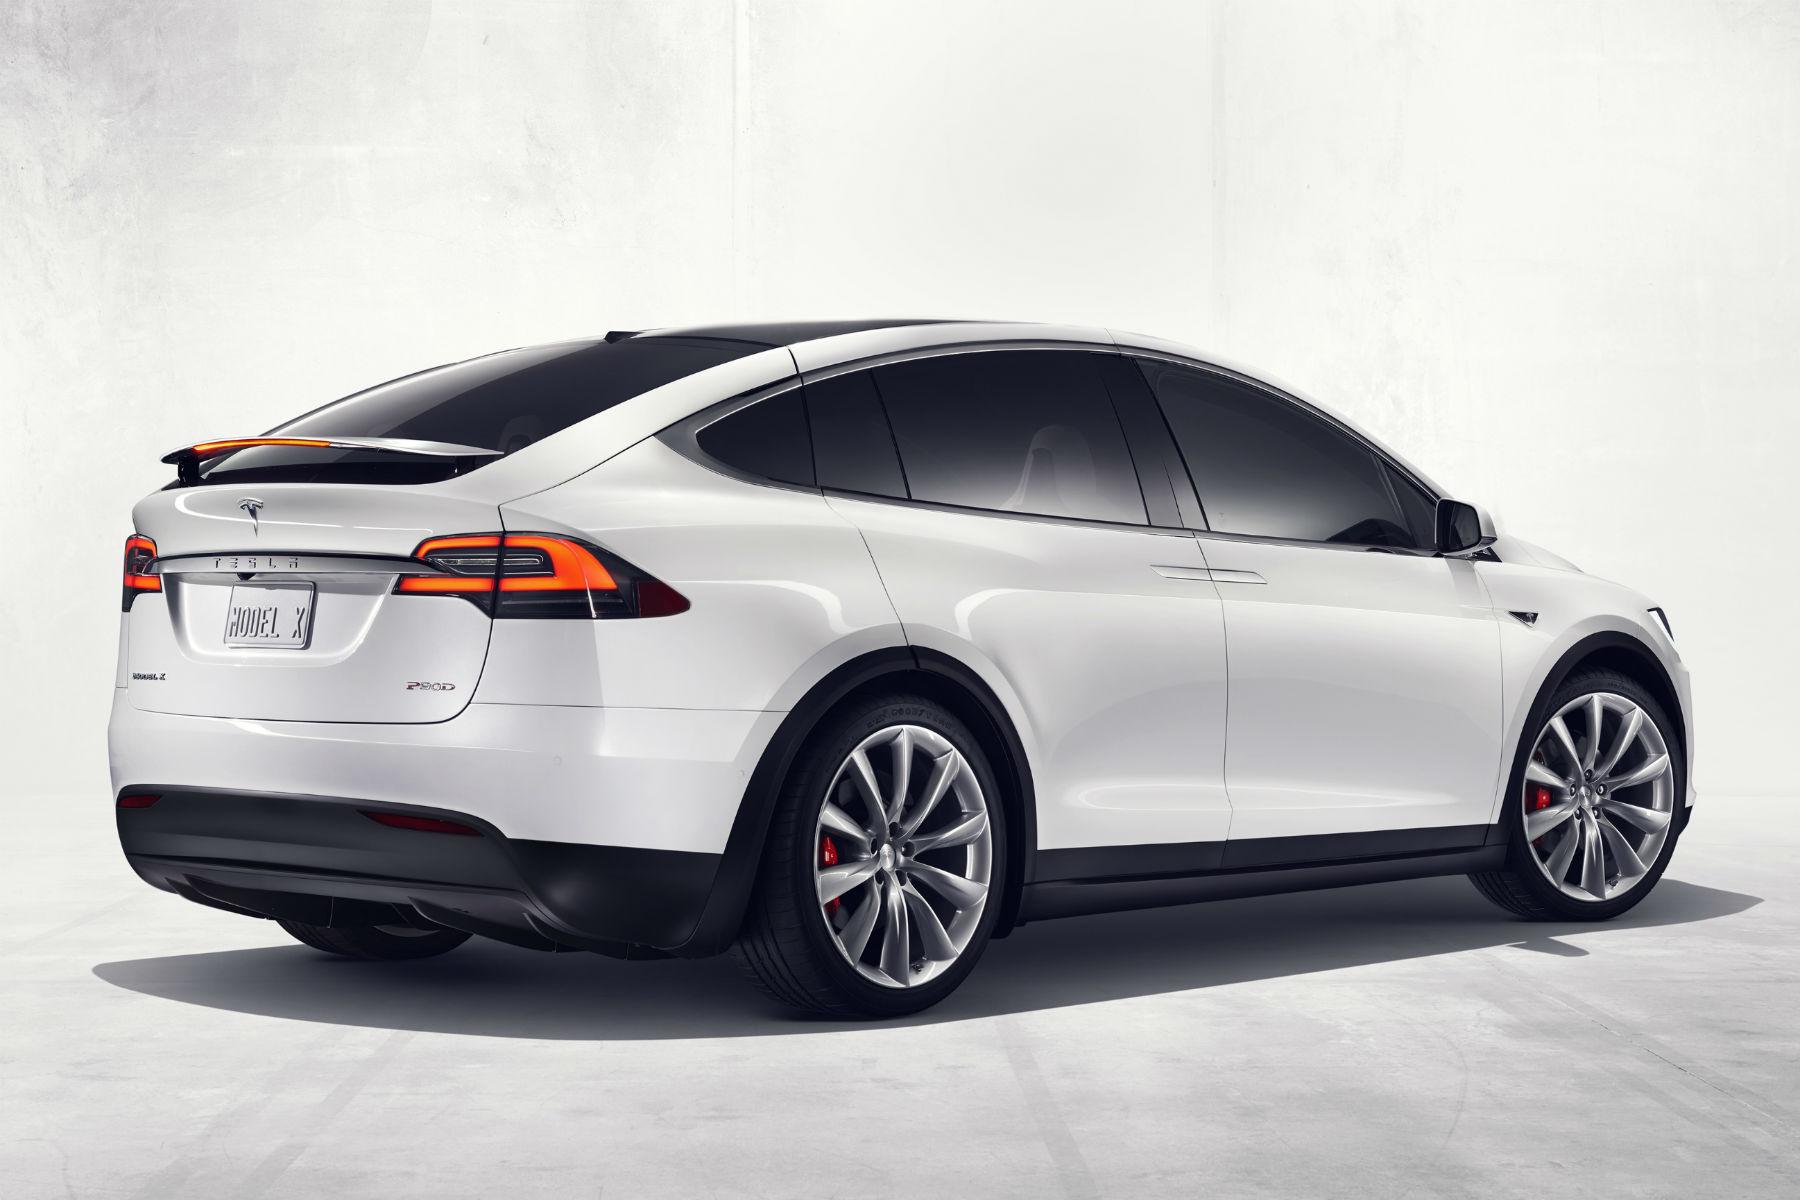 Elon Musk reveals Tesla Model X SUV